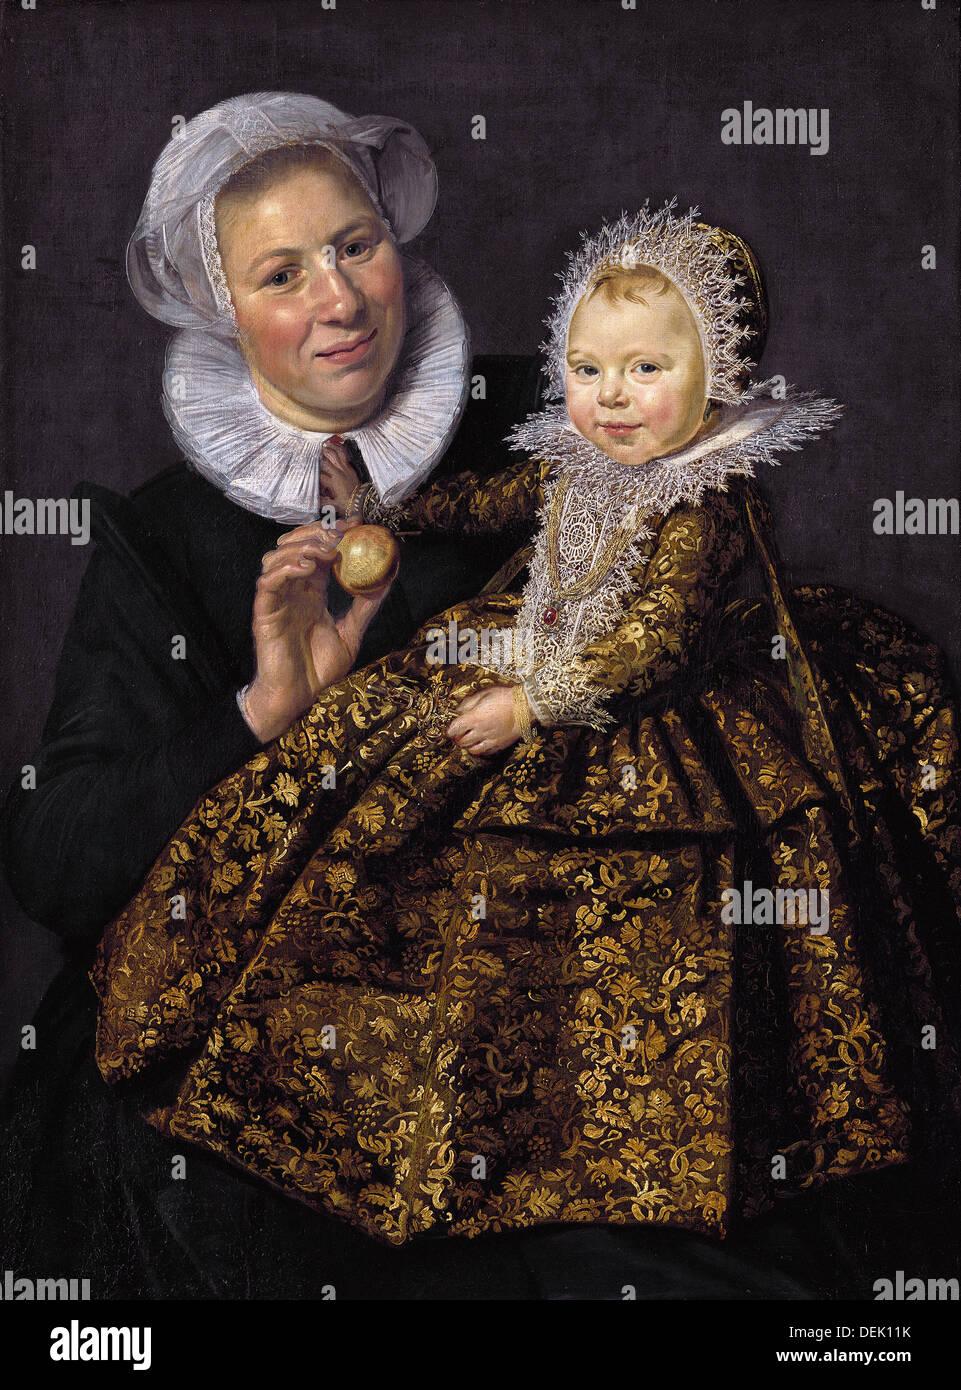 Frans Hals / sterben Amme Mit Dem Art - 1620 - Gemäldegalerie - Berlin Stockbild